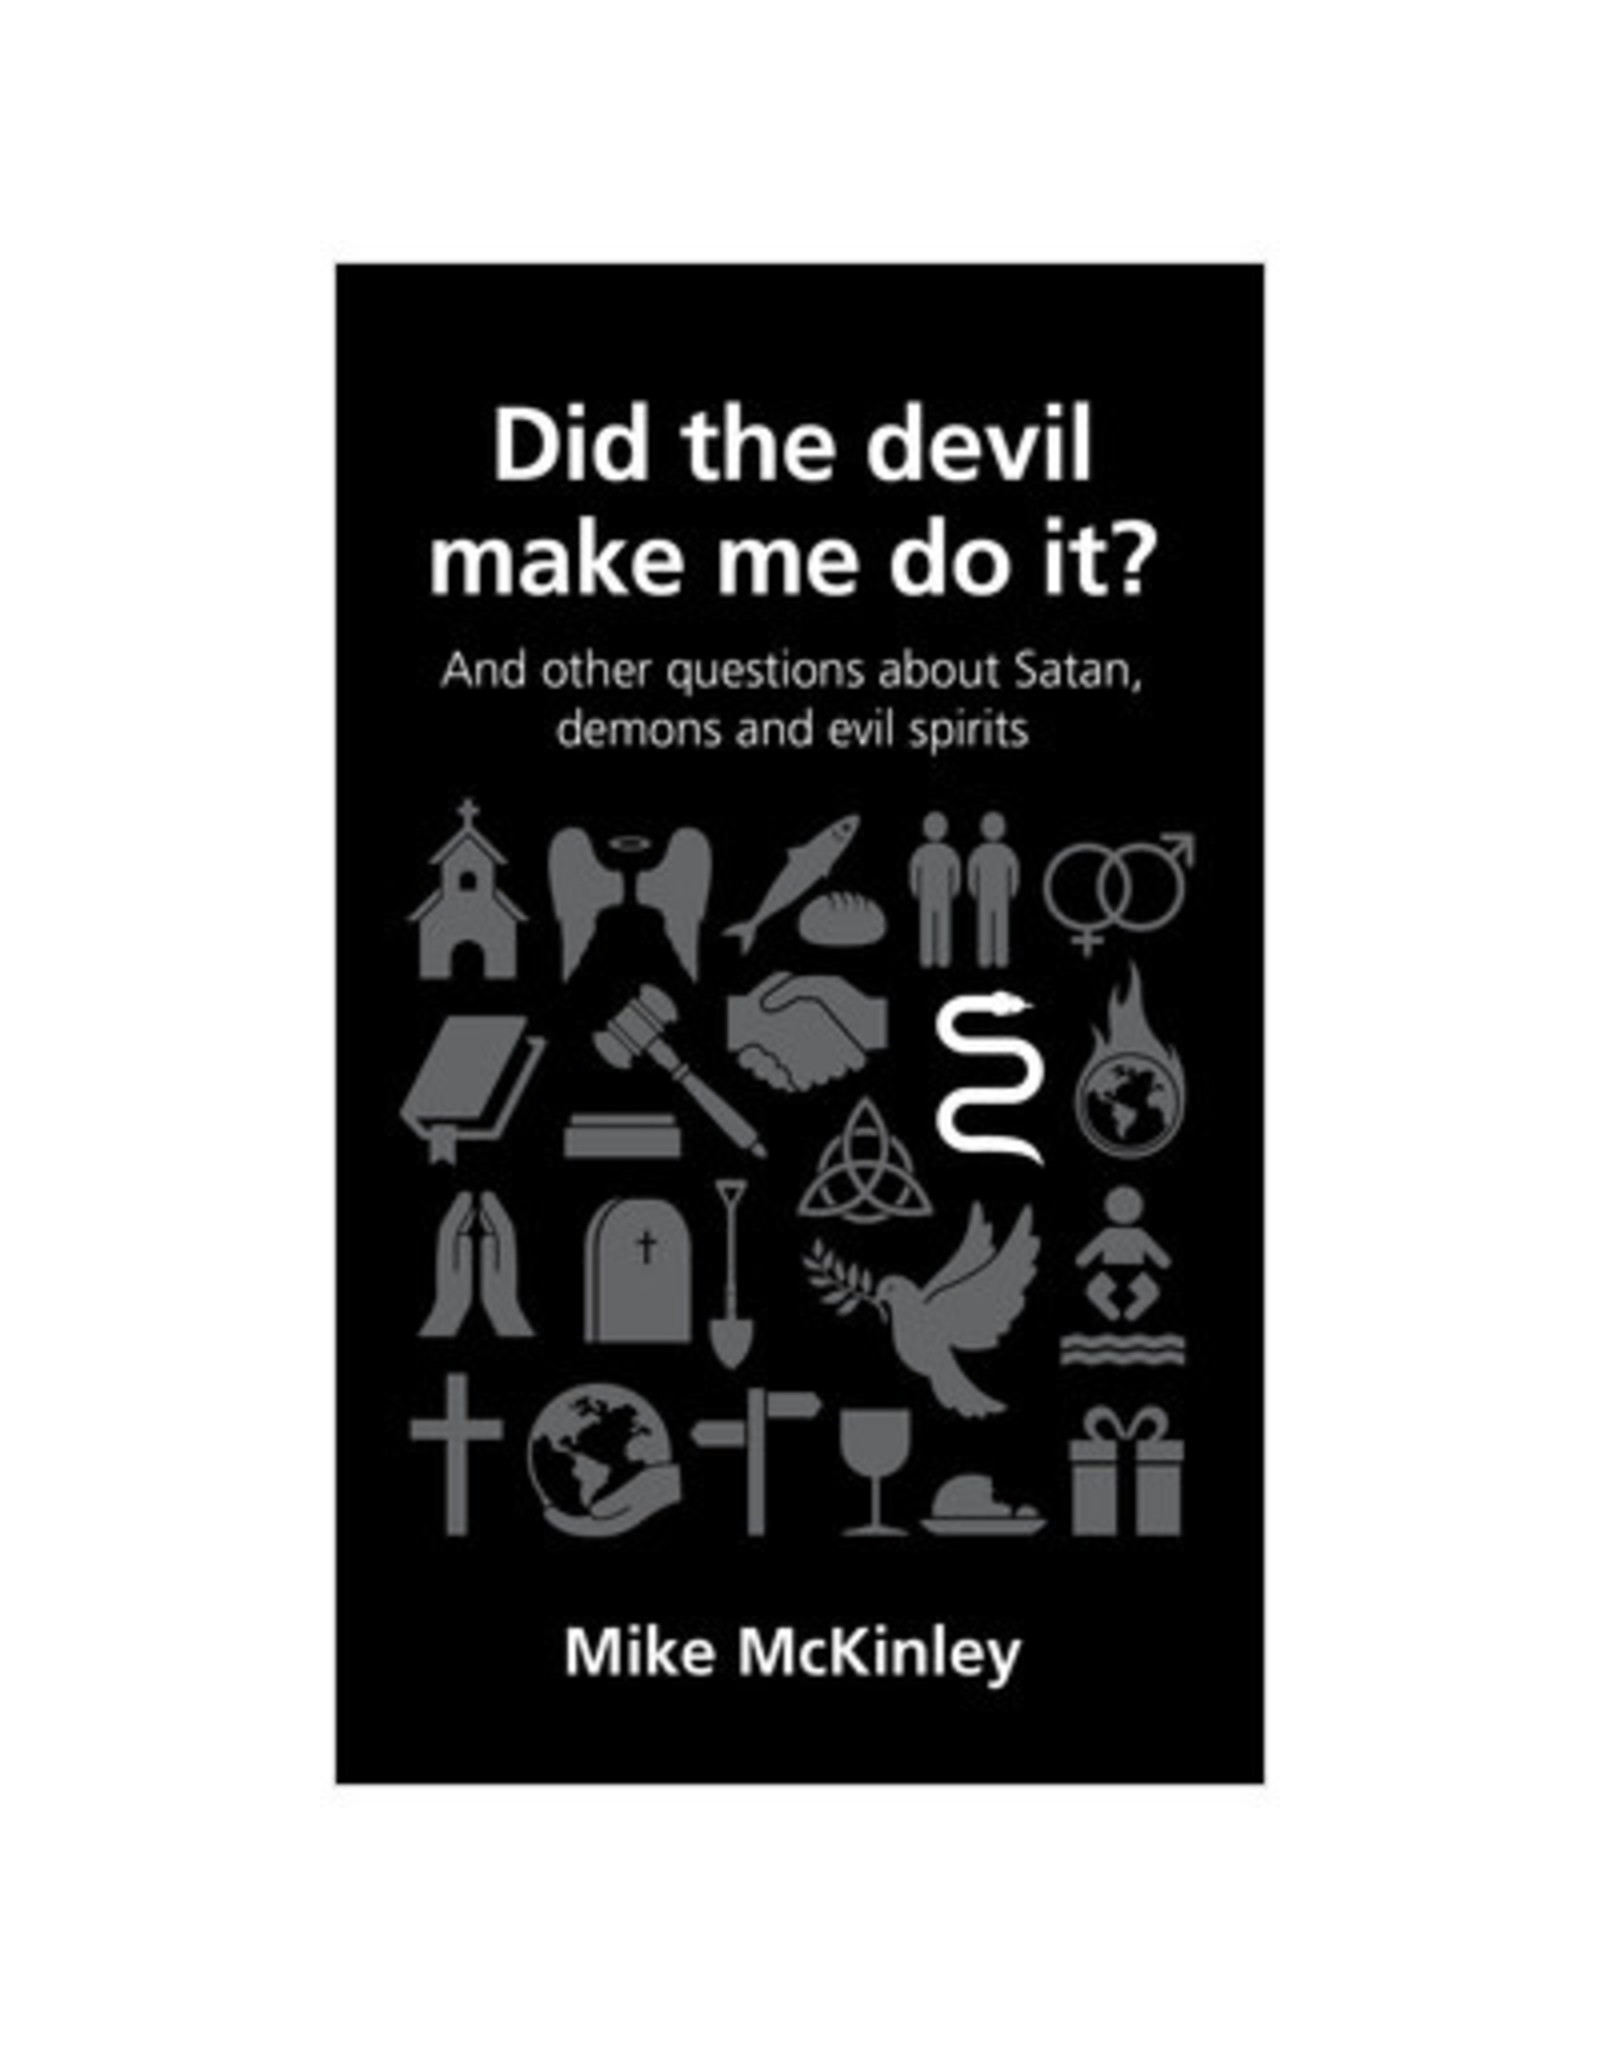 McKinley Did the devil make me do it?